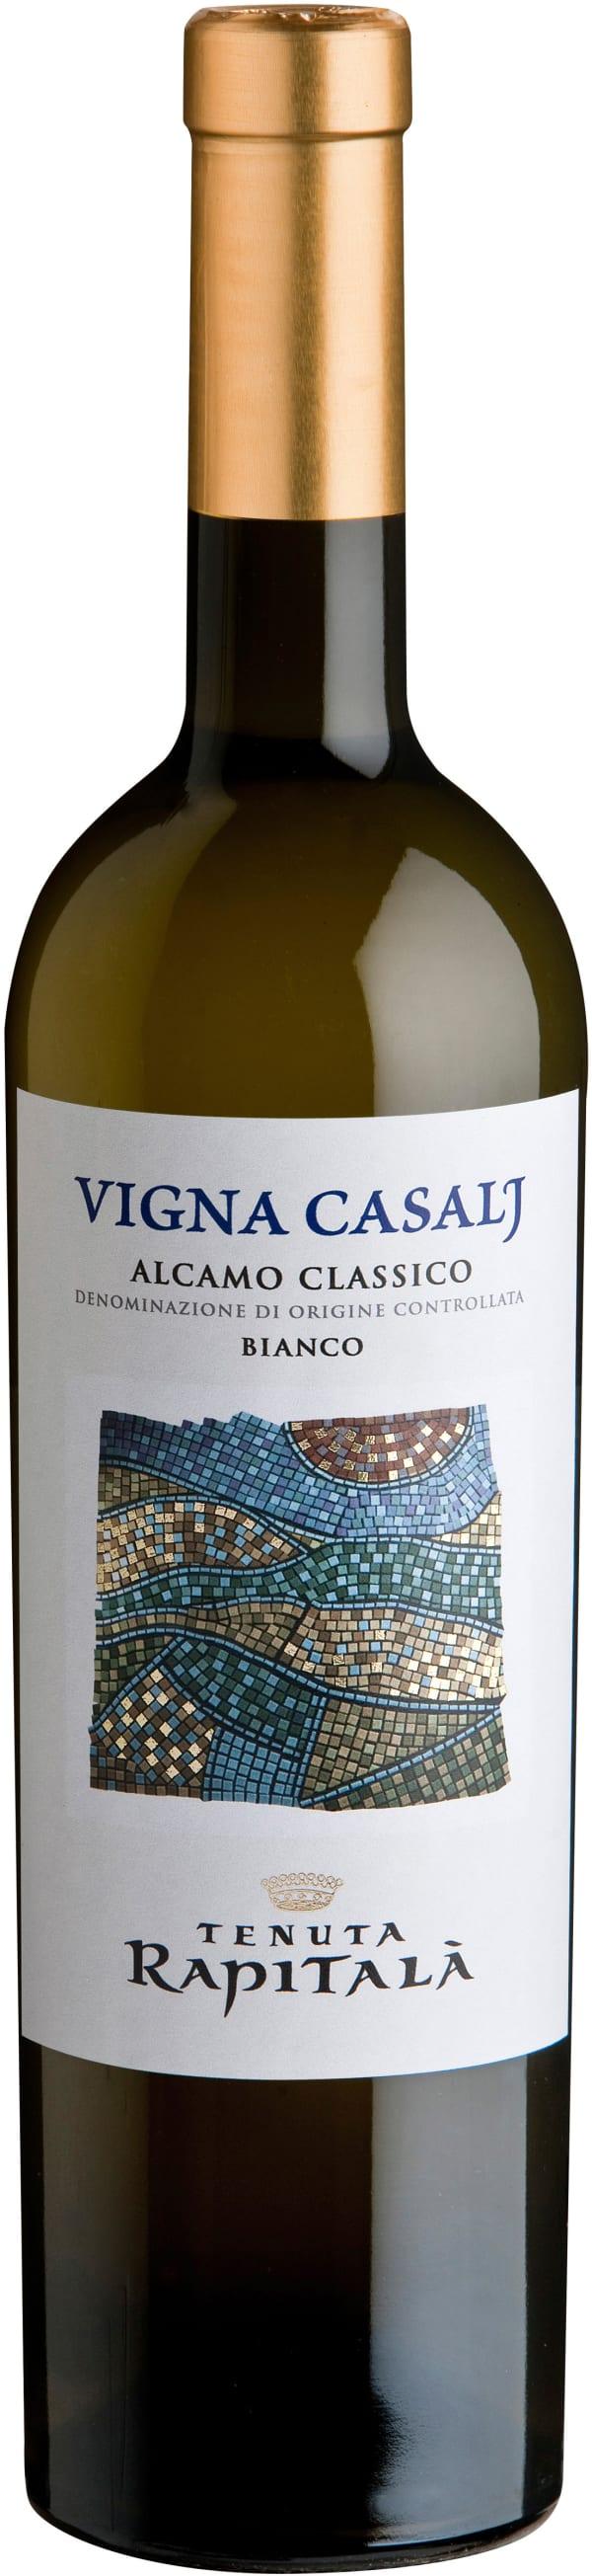 Tenute Rapitala Vigna Casalj Bianco 2016